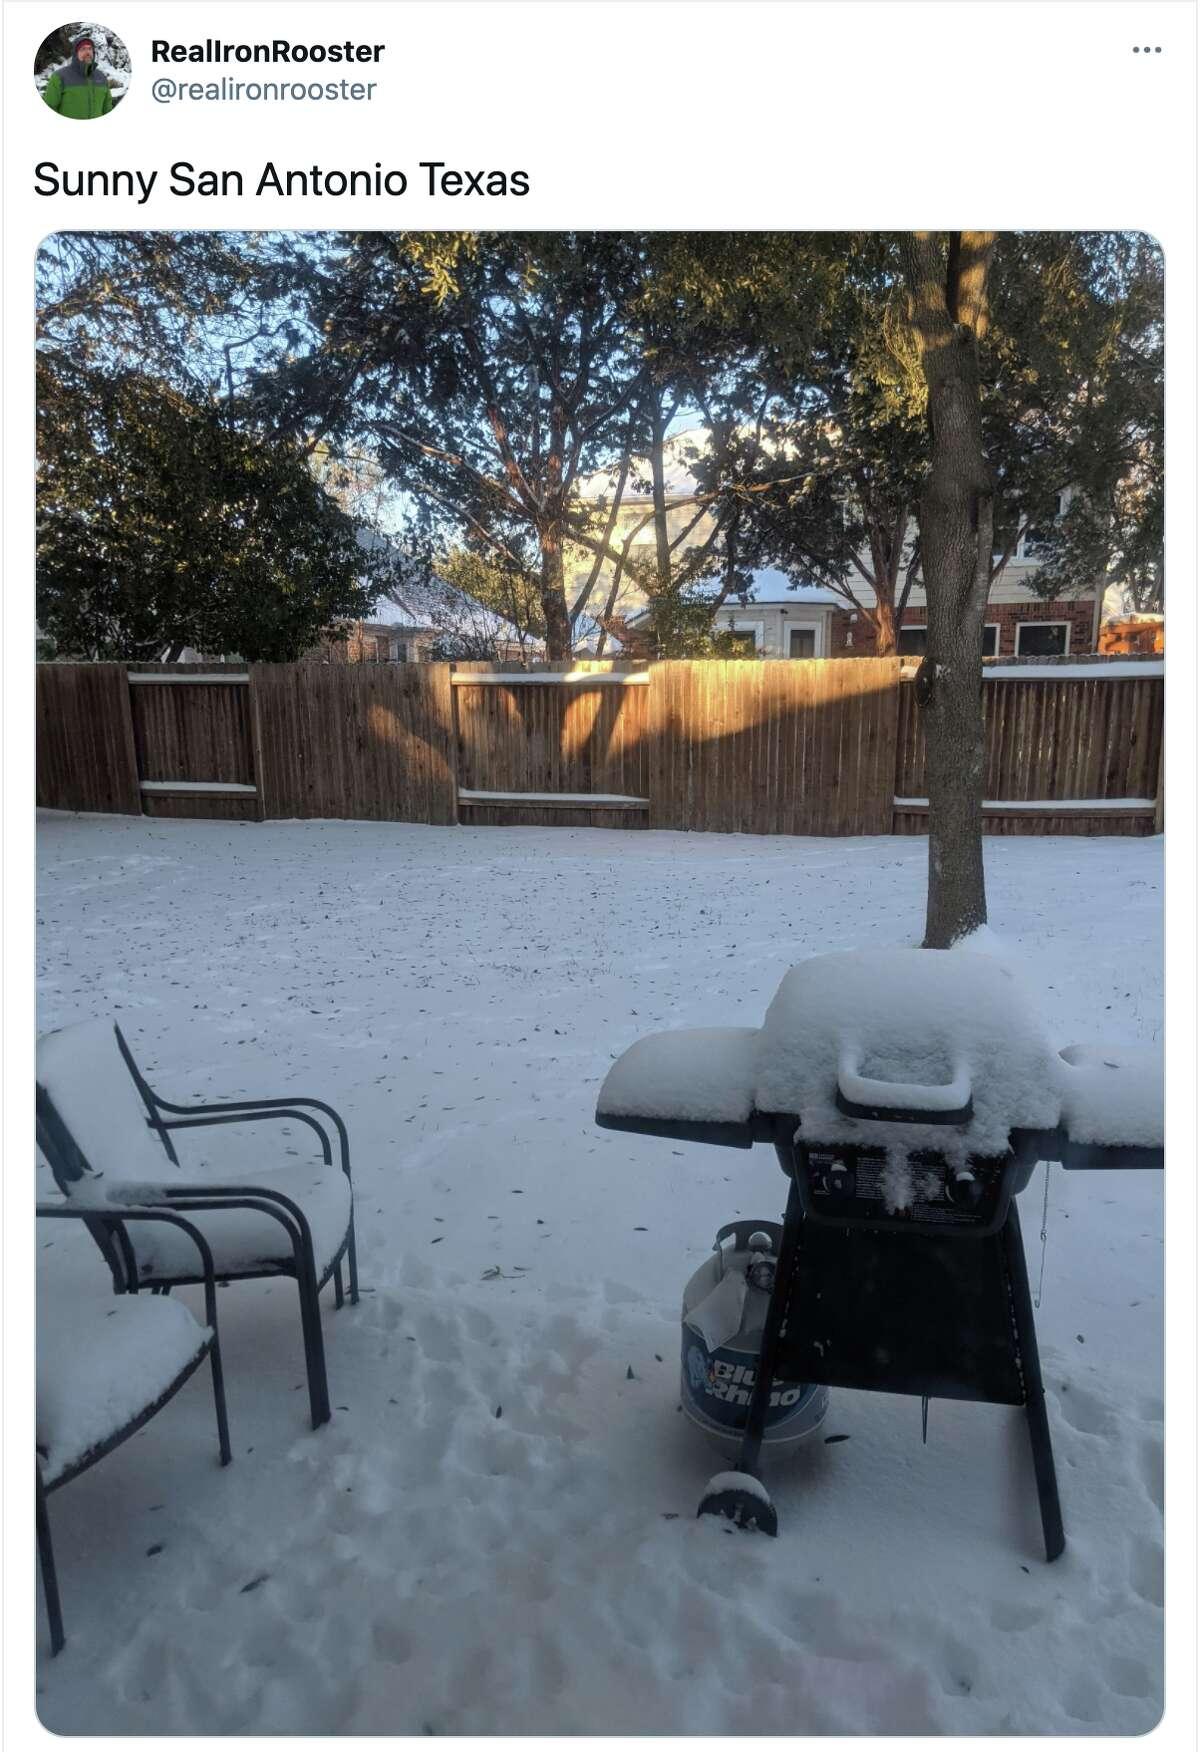 San Antonio reacts to snowfall throughout the city, February 15, 2021.